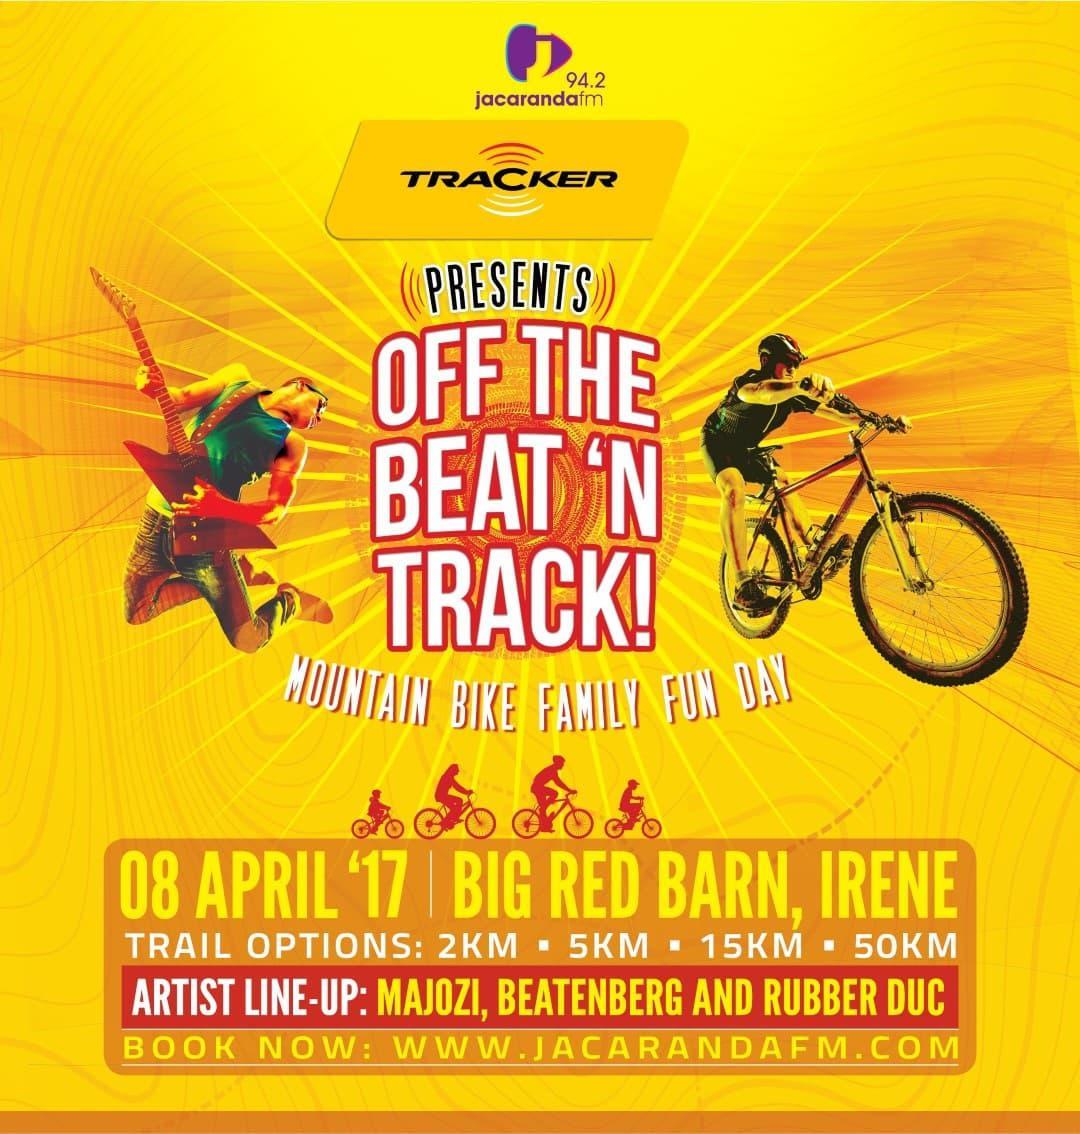 Tracker and Jacaranda FM present Off the Beat 'n Track ...